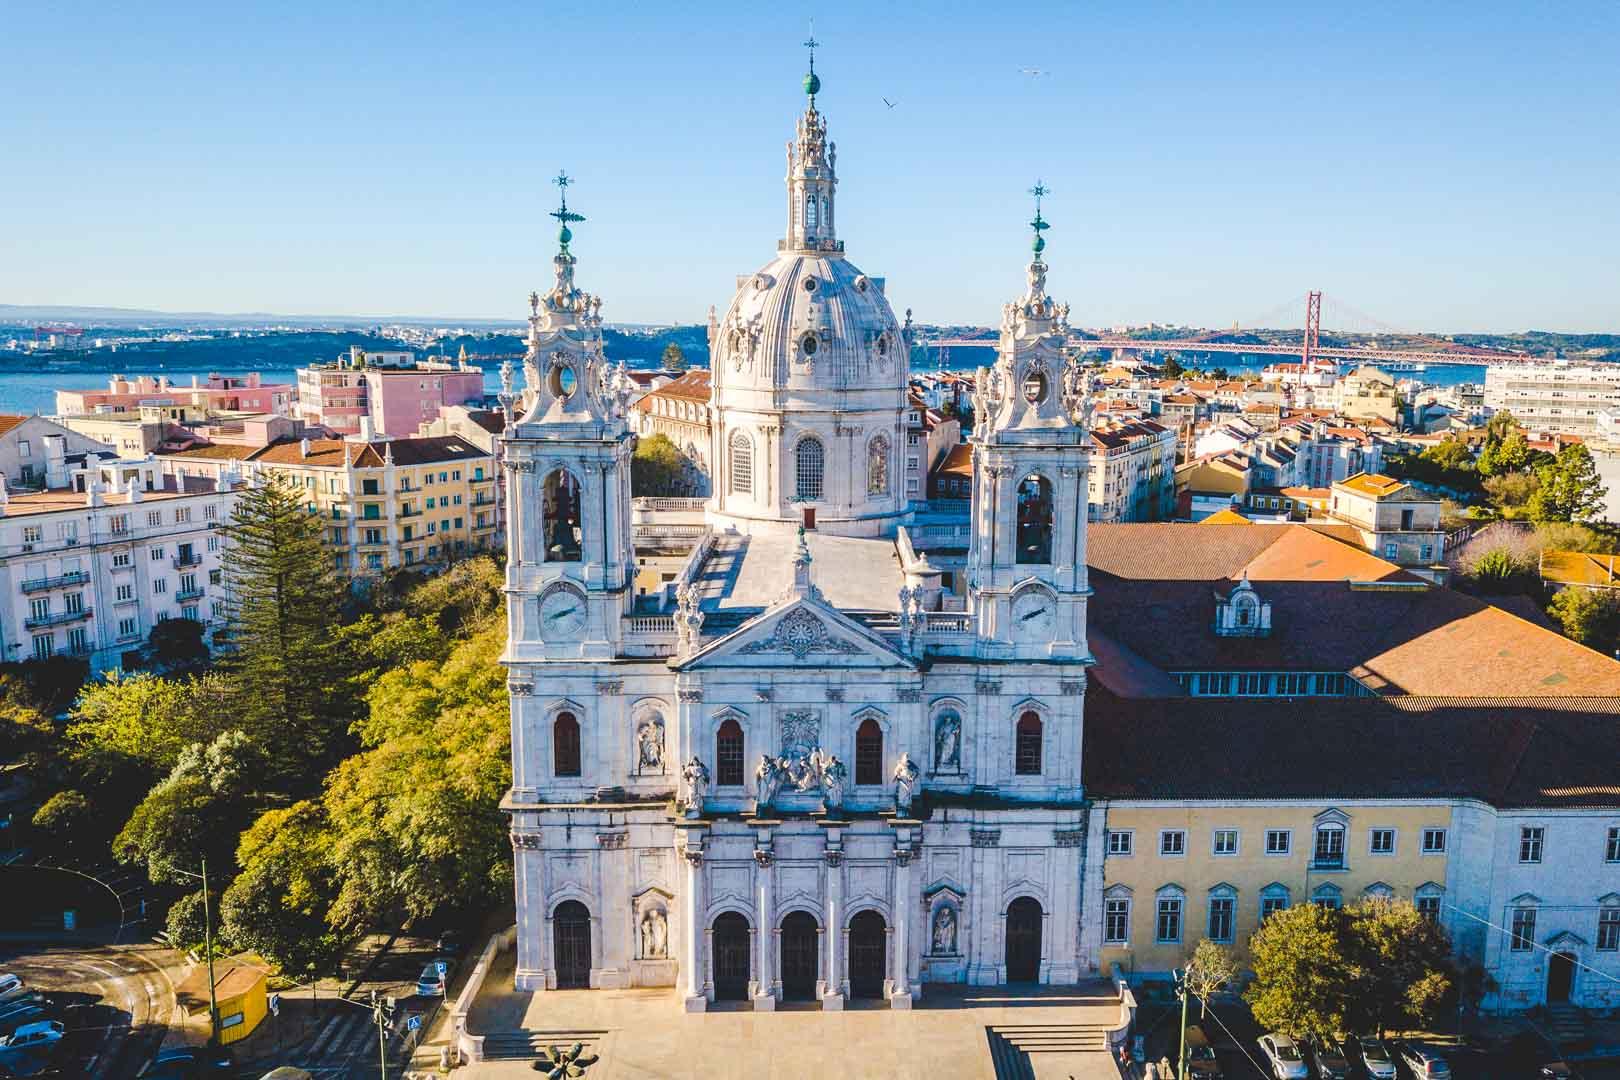 Basilica da Estrela, Lisbon - Don't Miss This Gem of Baroque Architecture!